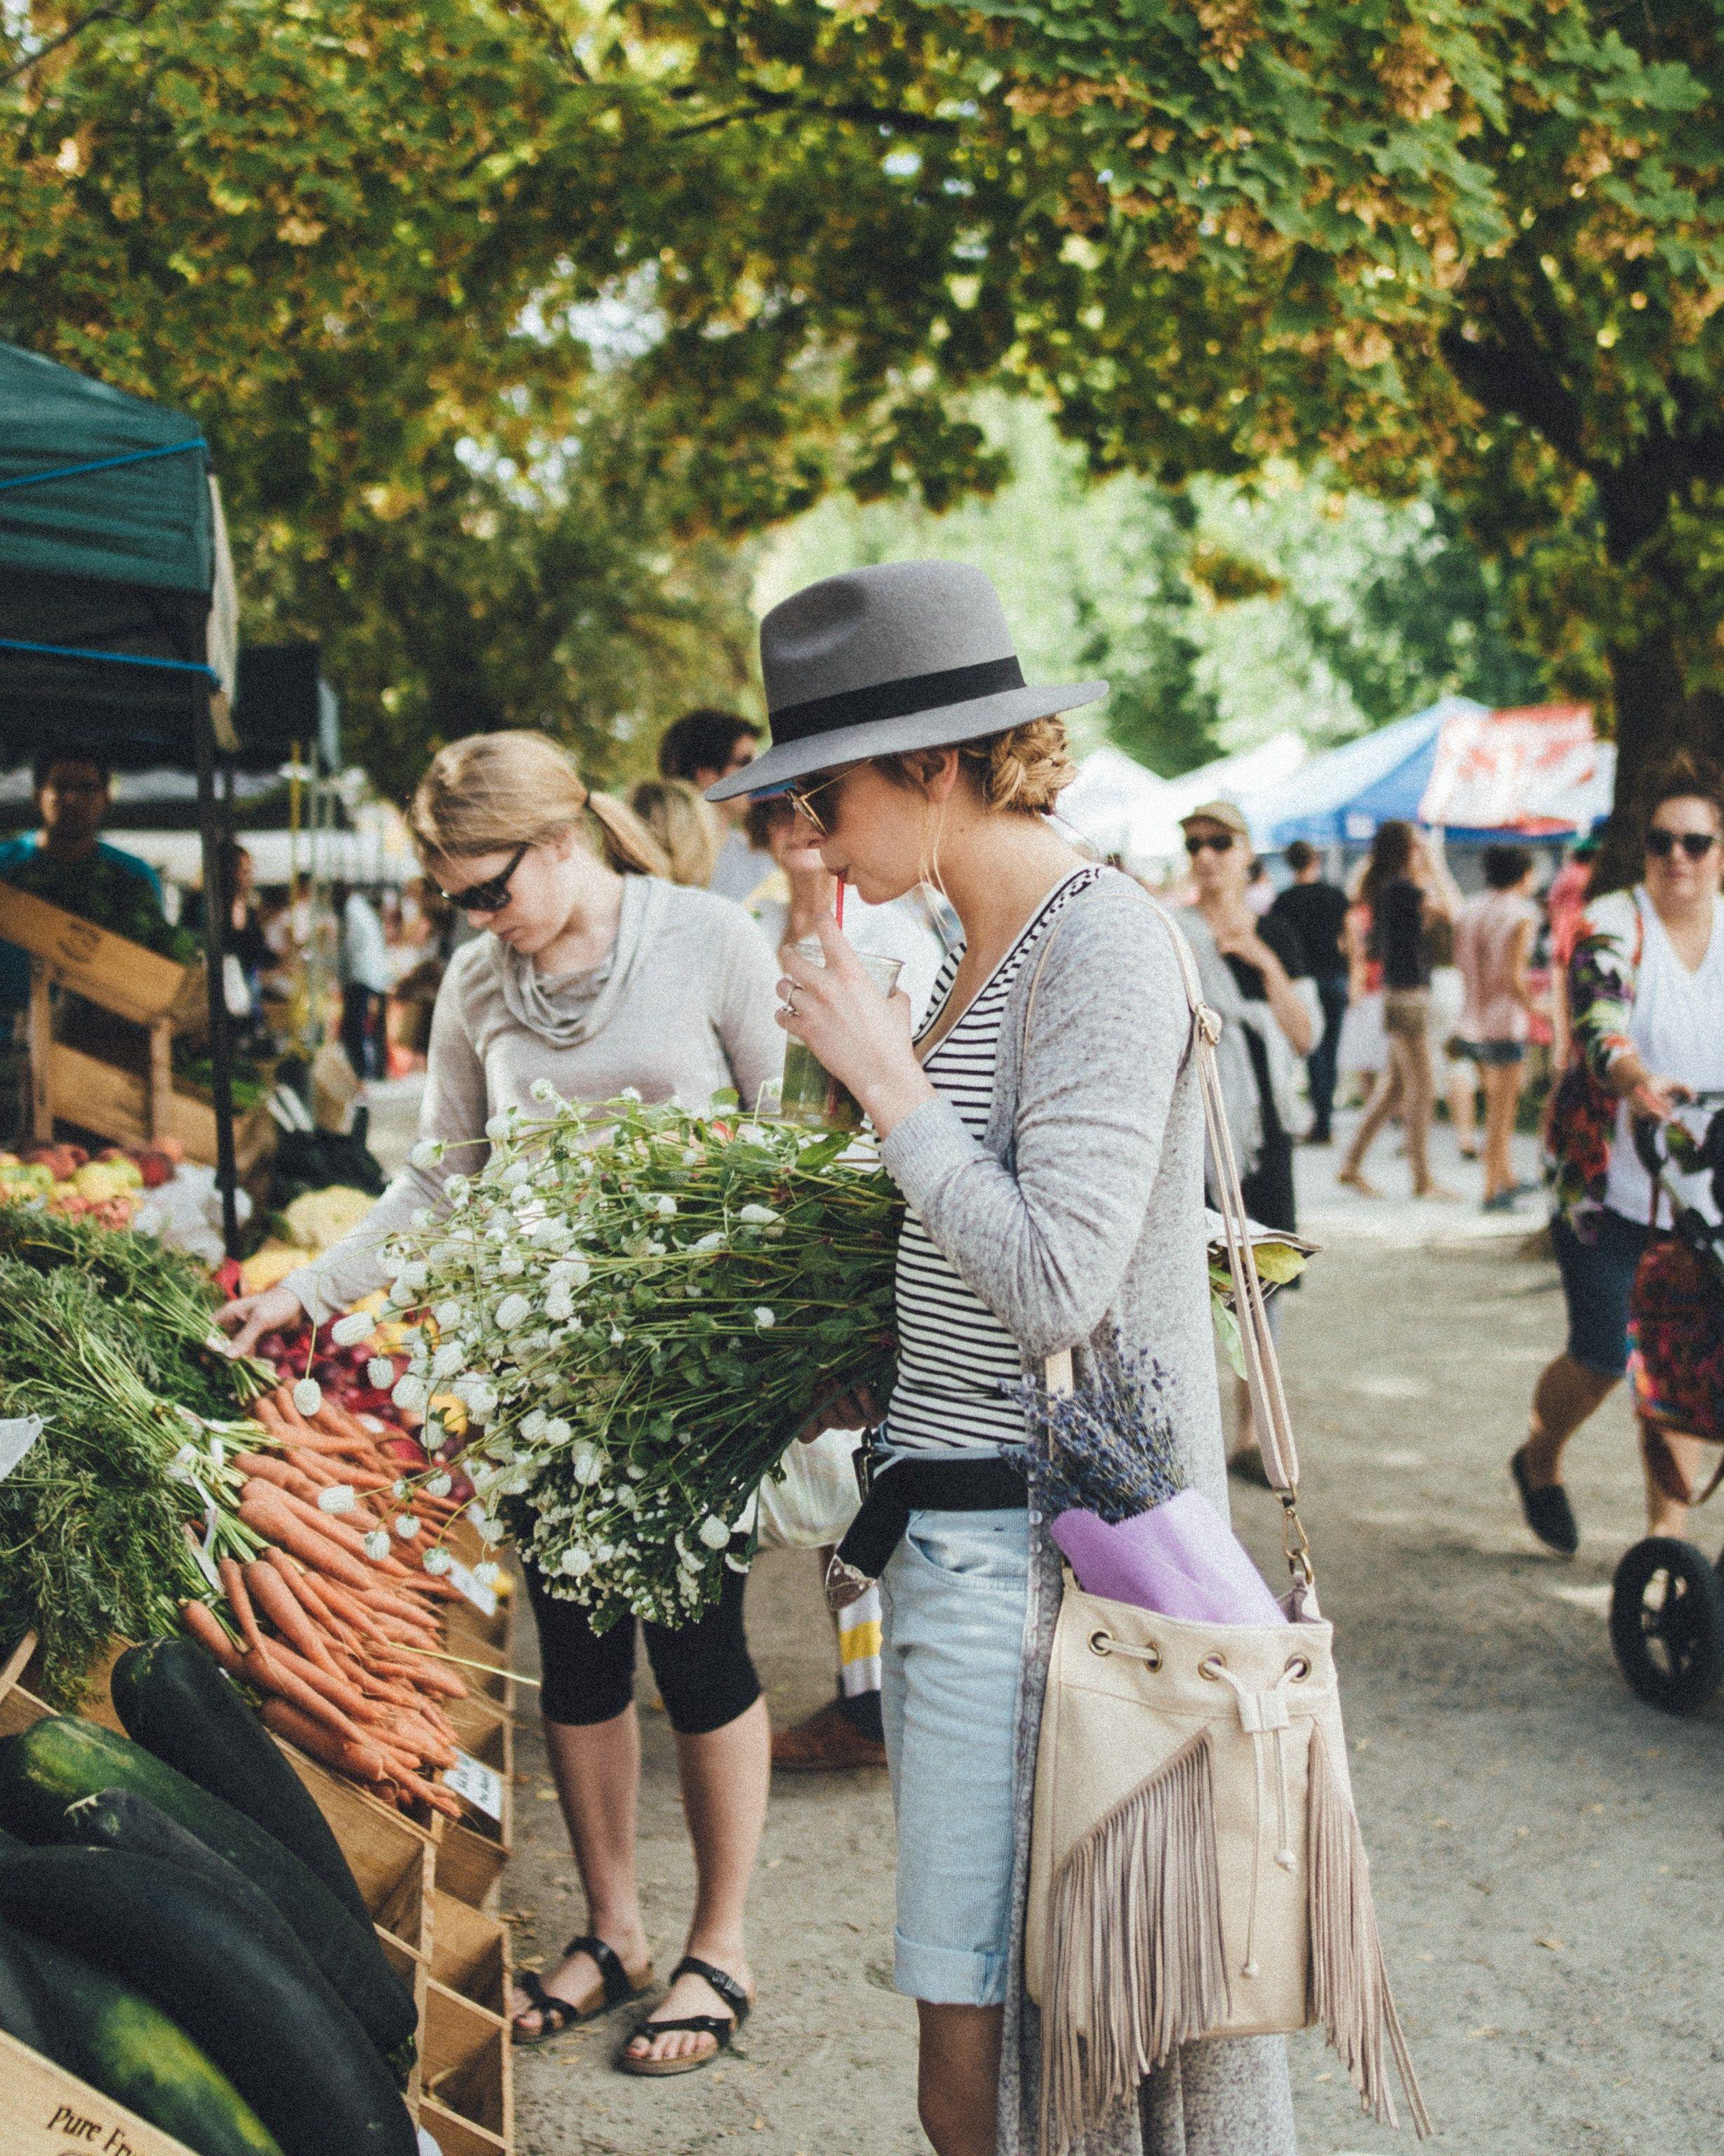 Market Mornings | Makenna Alyse